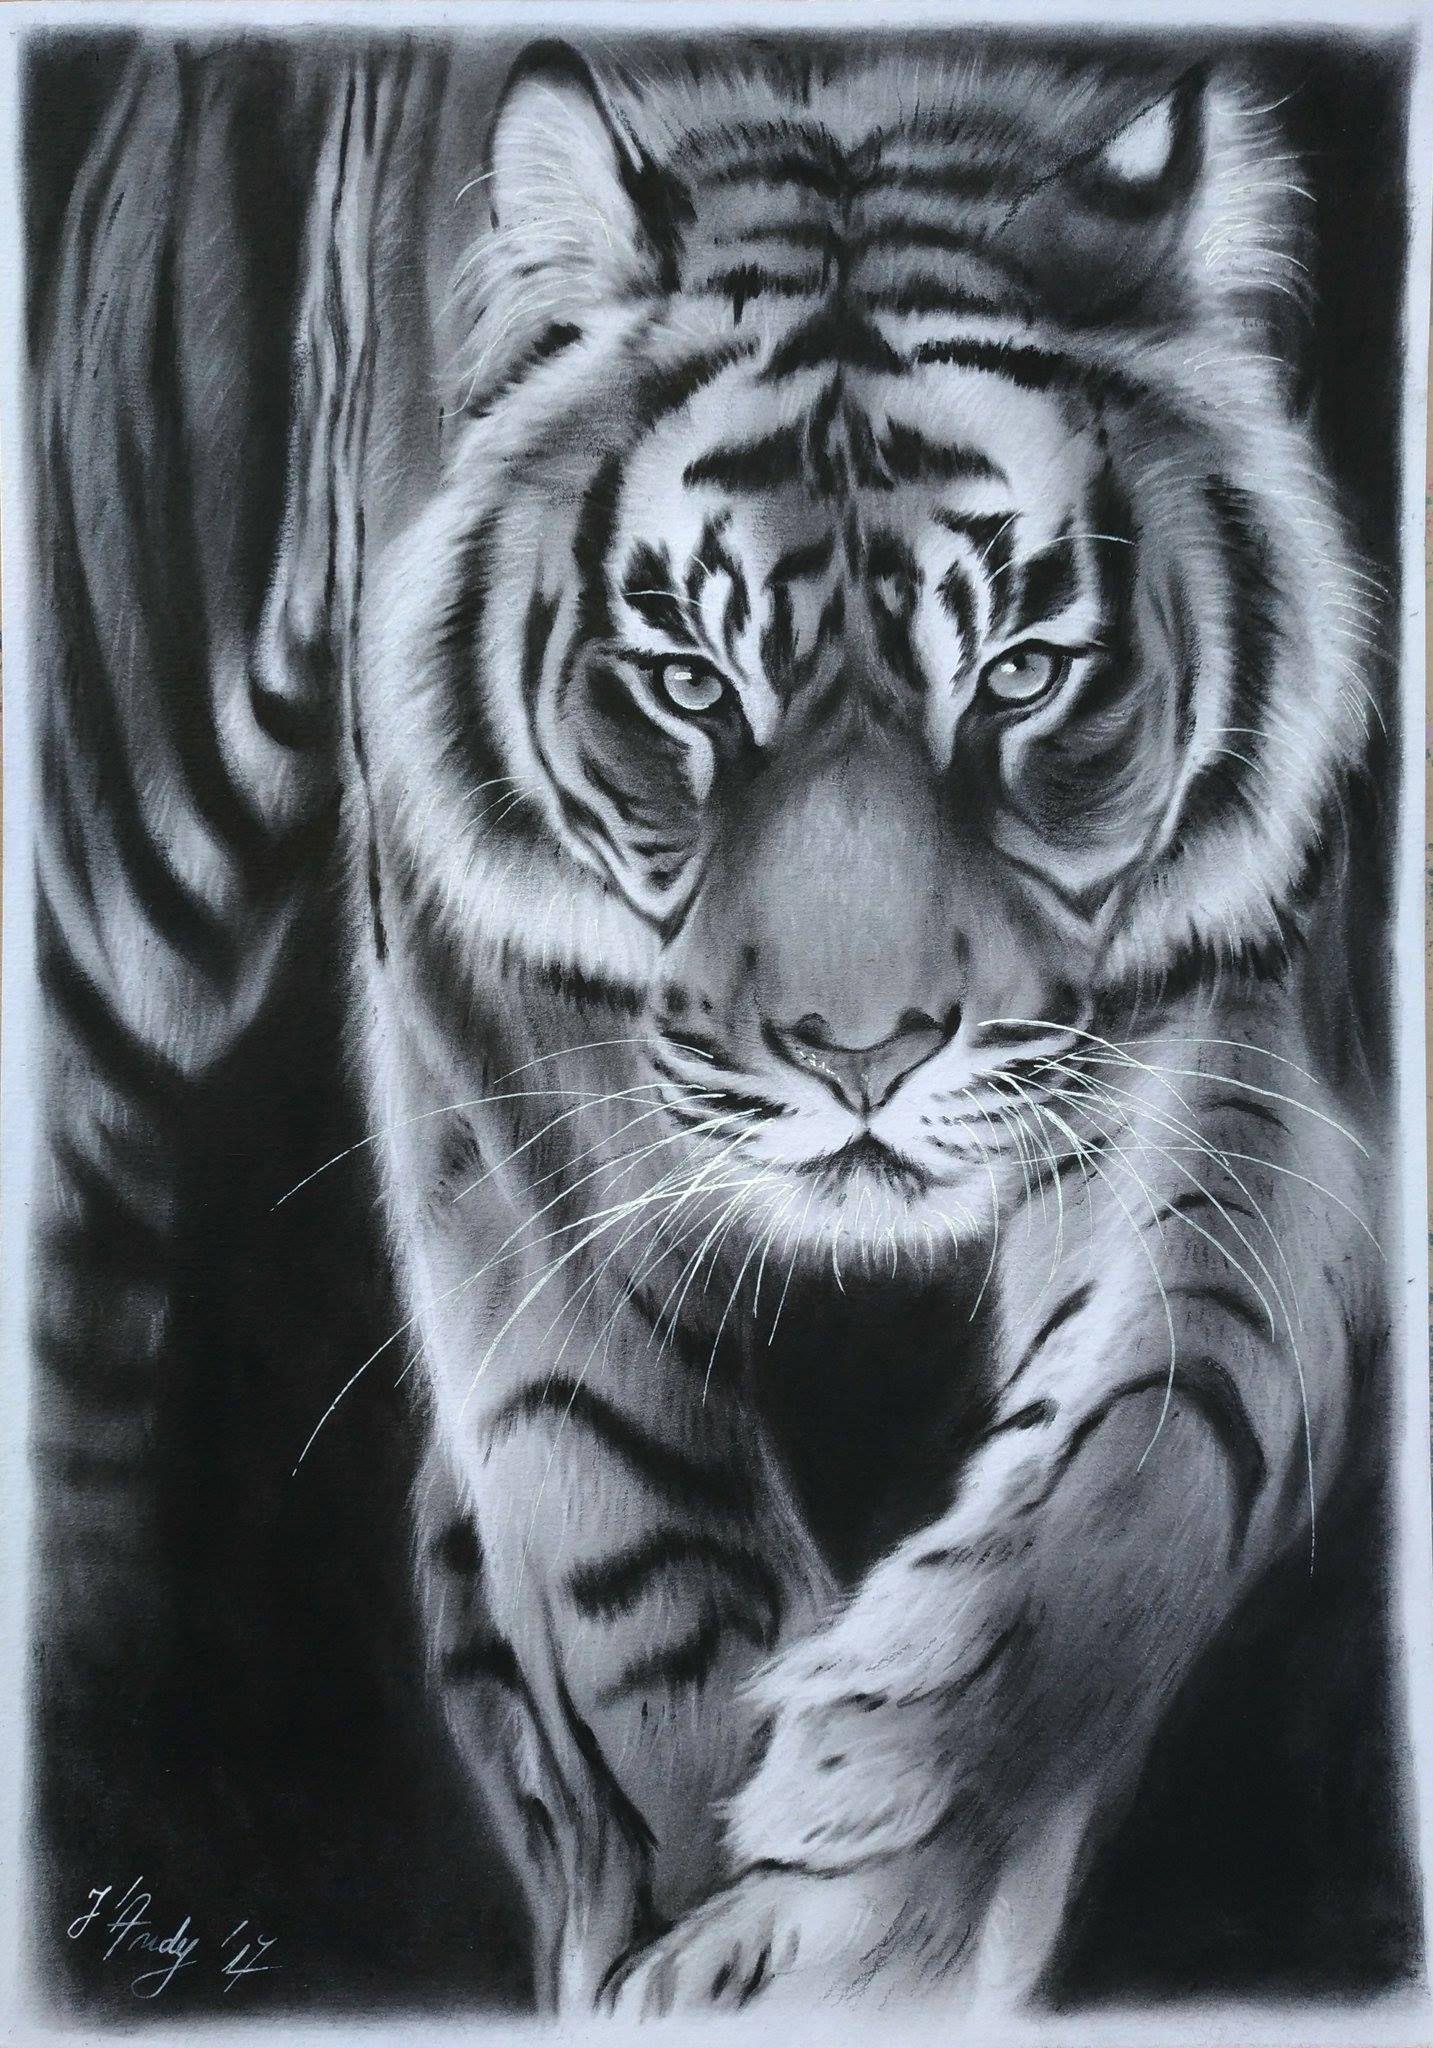 wallart tiger tigerart animaldrawing wildlifeart animalart oilonpaper originalart artwork